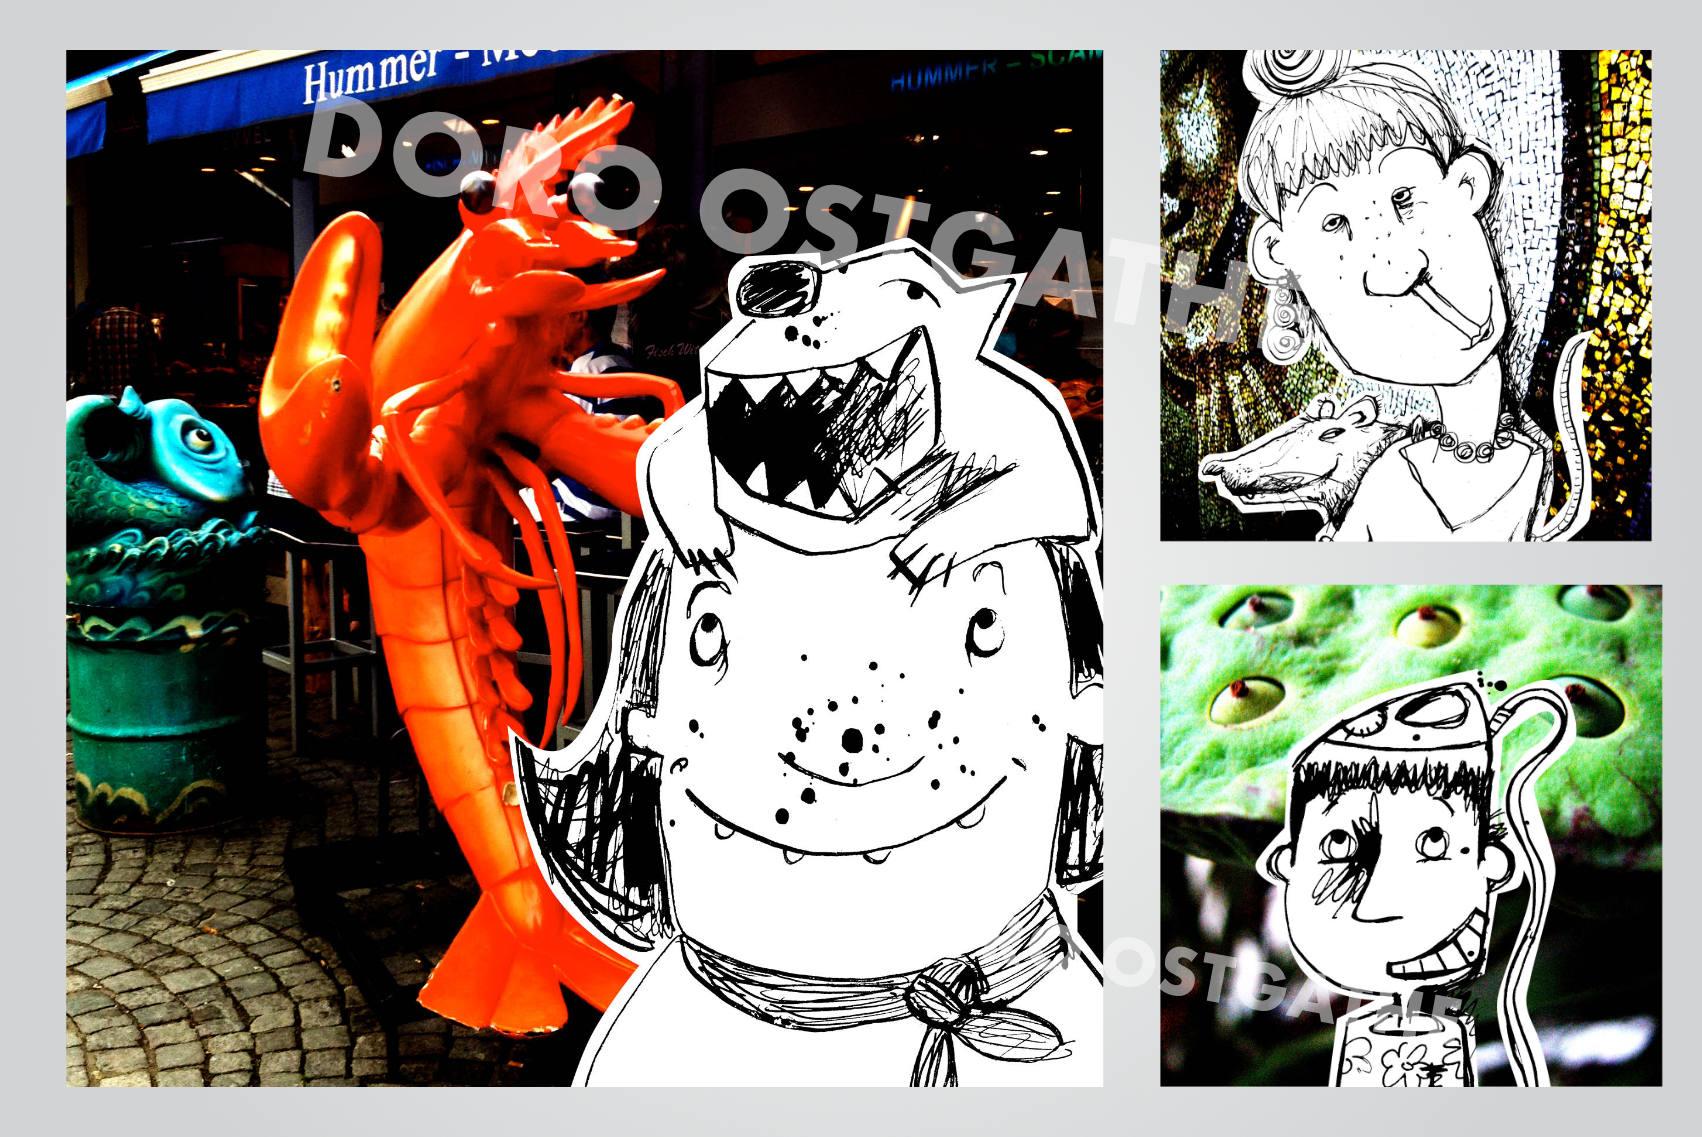 illustration-kunst-art-ostgathe-07.jpg